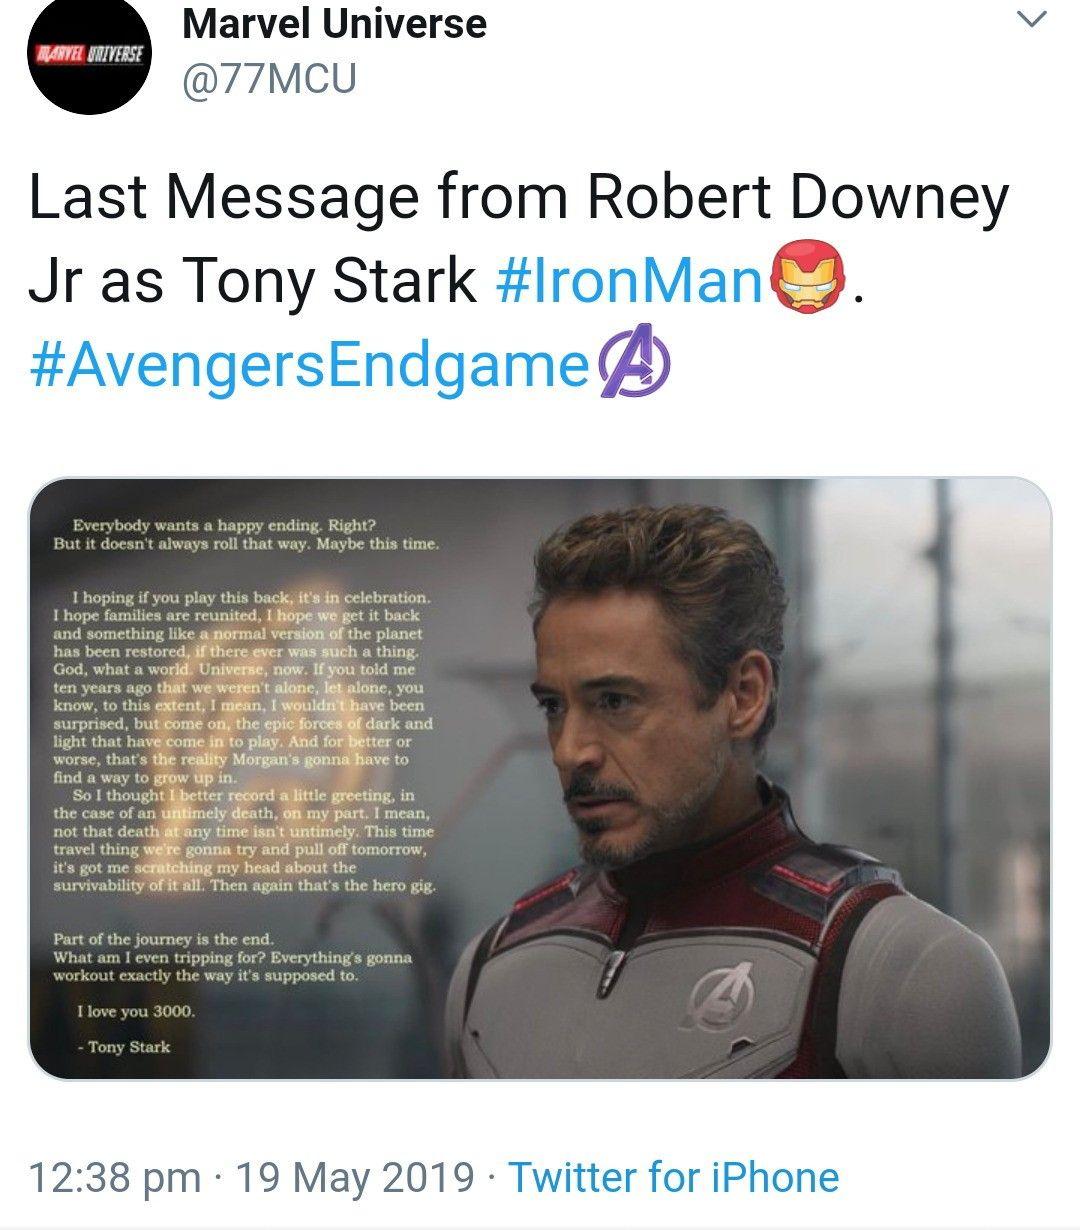 Pin By Ellice Snyder On Robert Downey Jr Marvel Marvel Superheroes Marvel Jokes